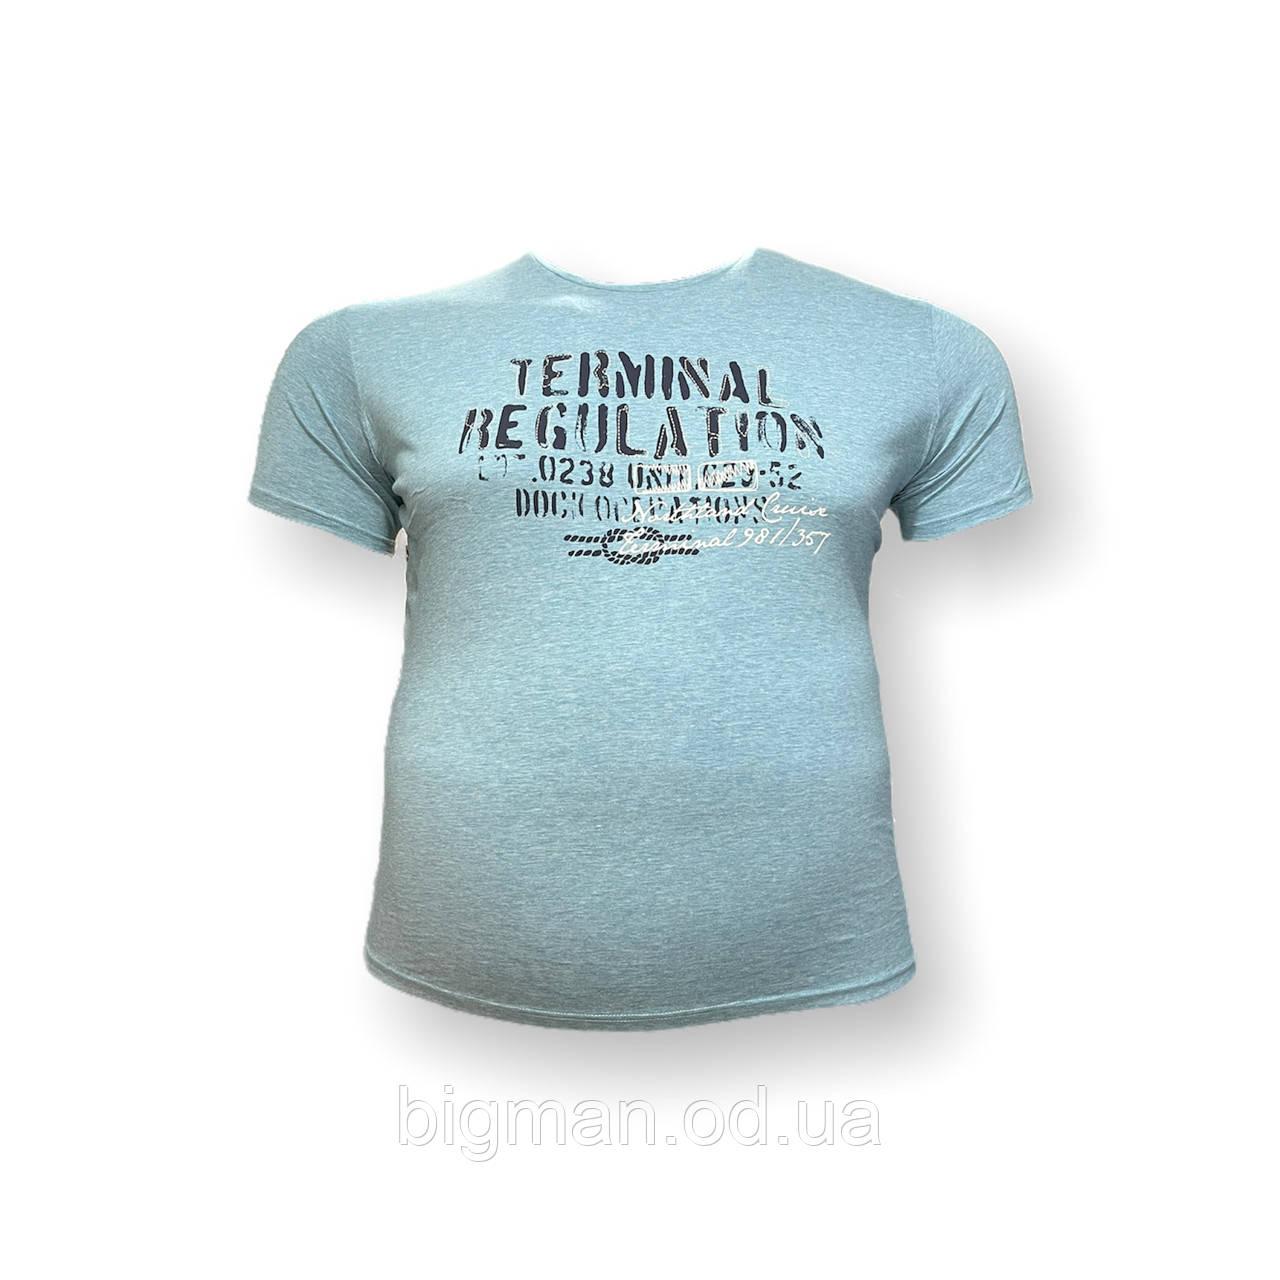 Мужская батальная футболка Monte Carlo 12096 3XL 4XL 5XL 6XL 7XL голубая большие размеры Турция